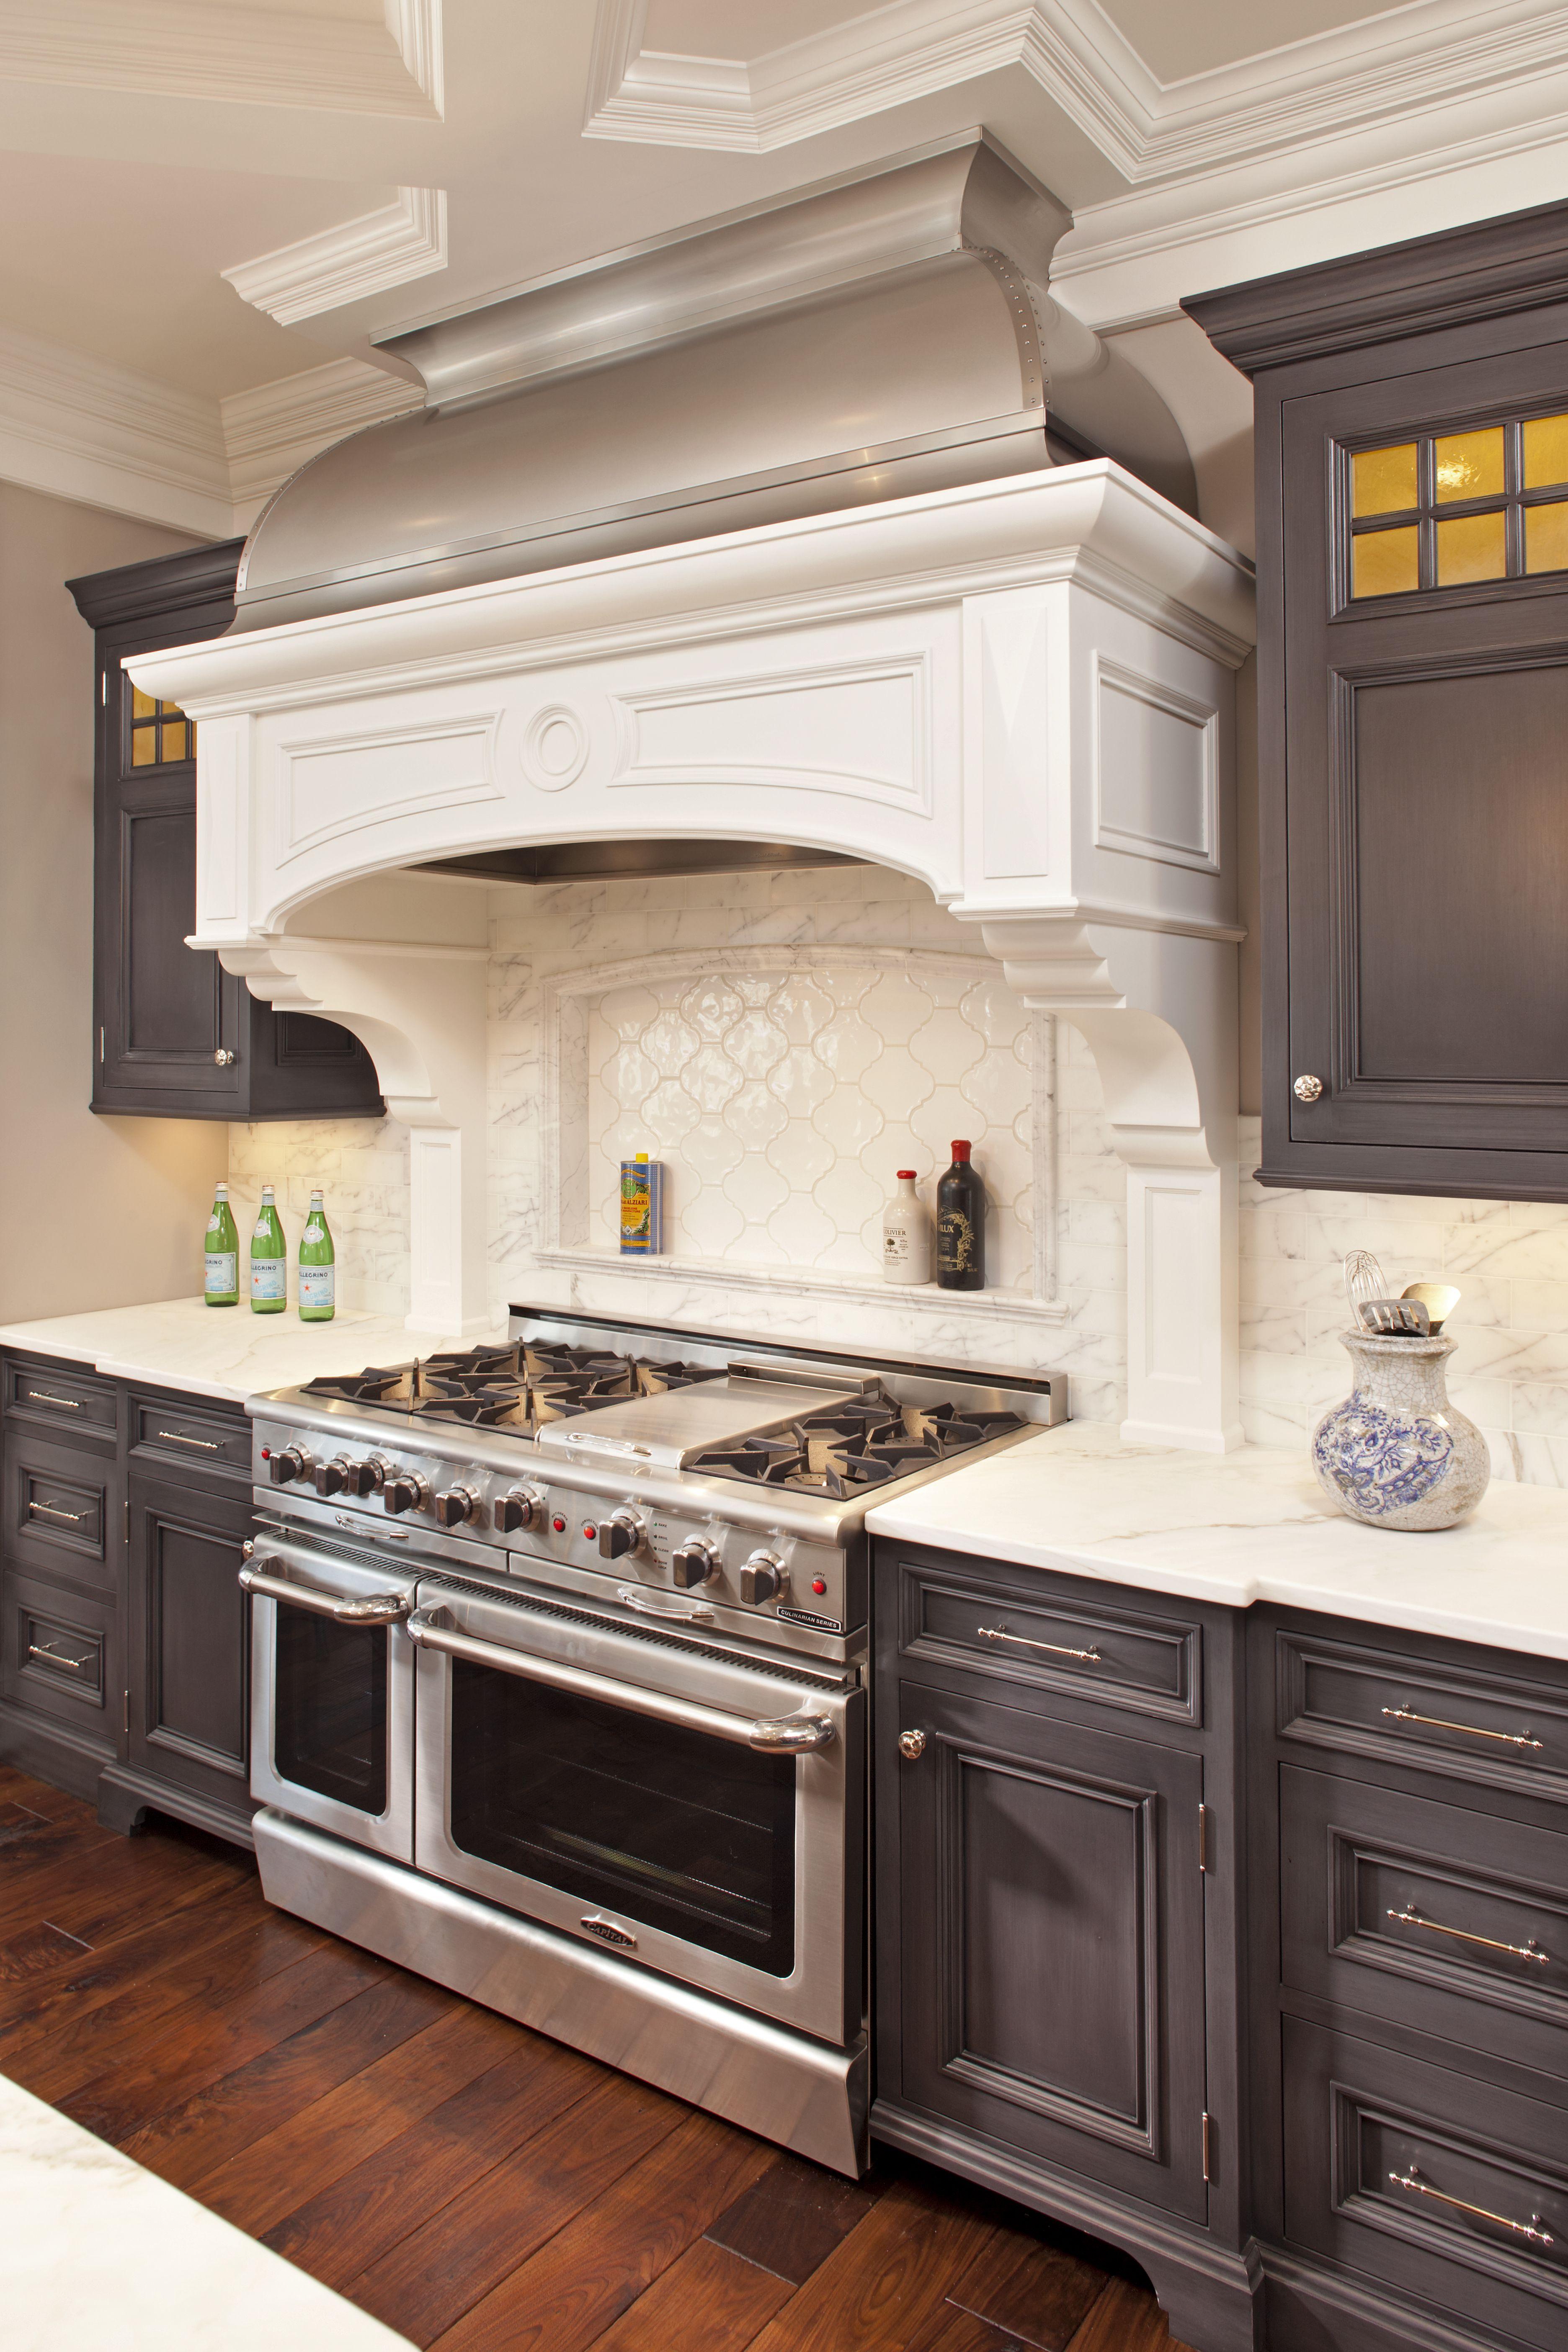 Willow Road Pillar Homes Diy Kitchen Cupboards Kitchen Cabinets Kitchen Remodel